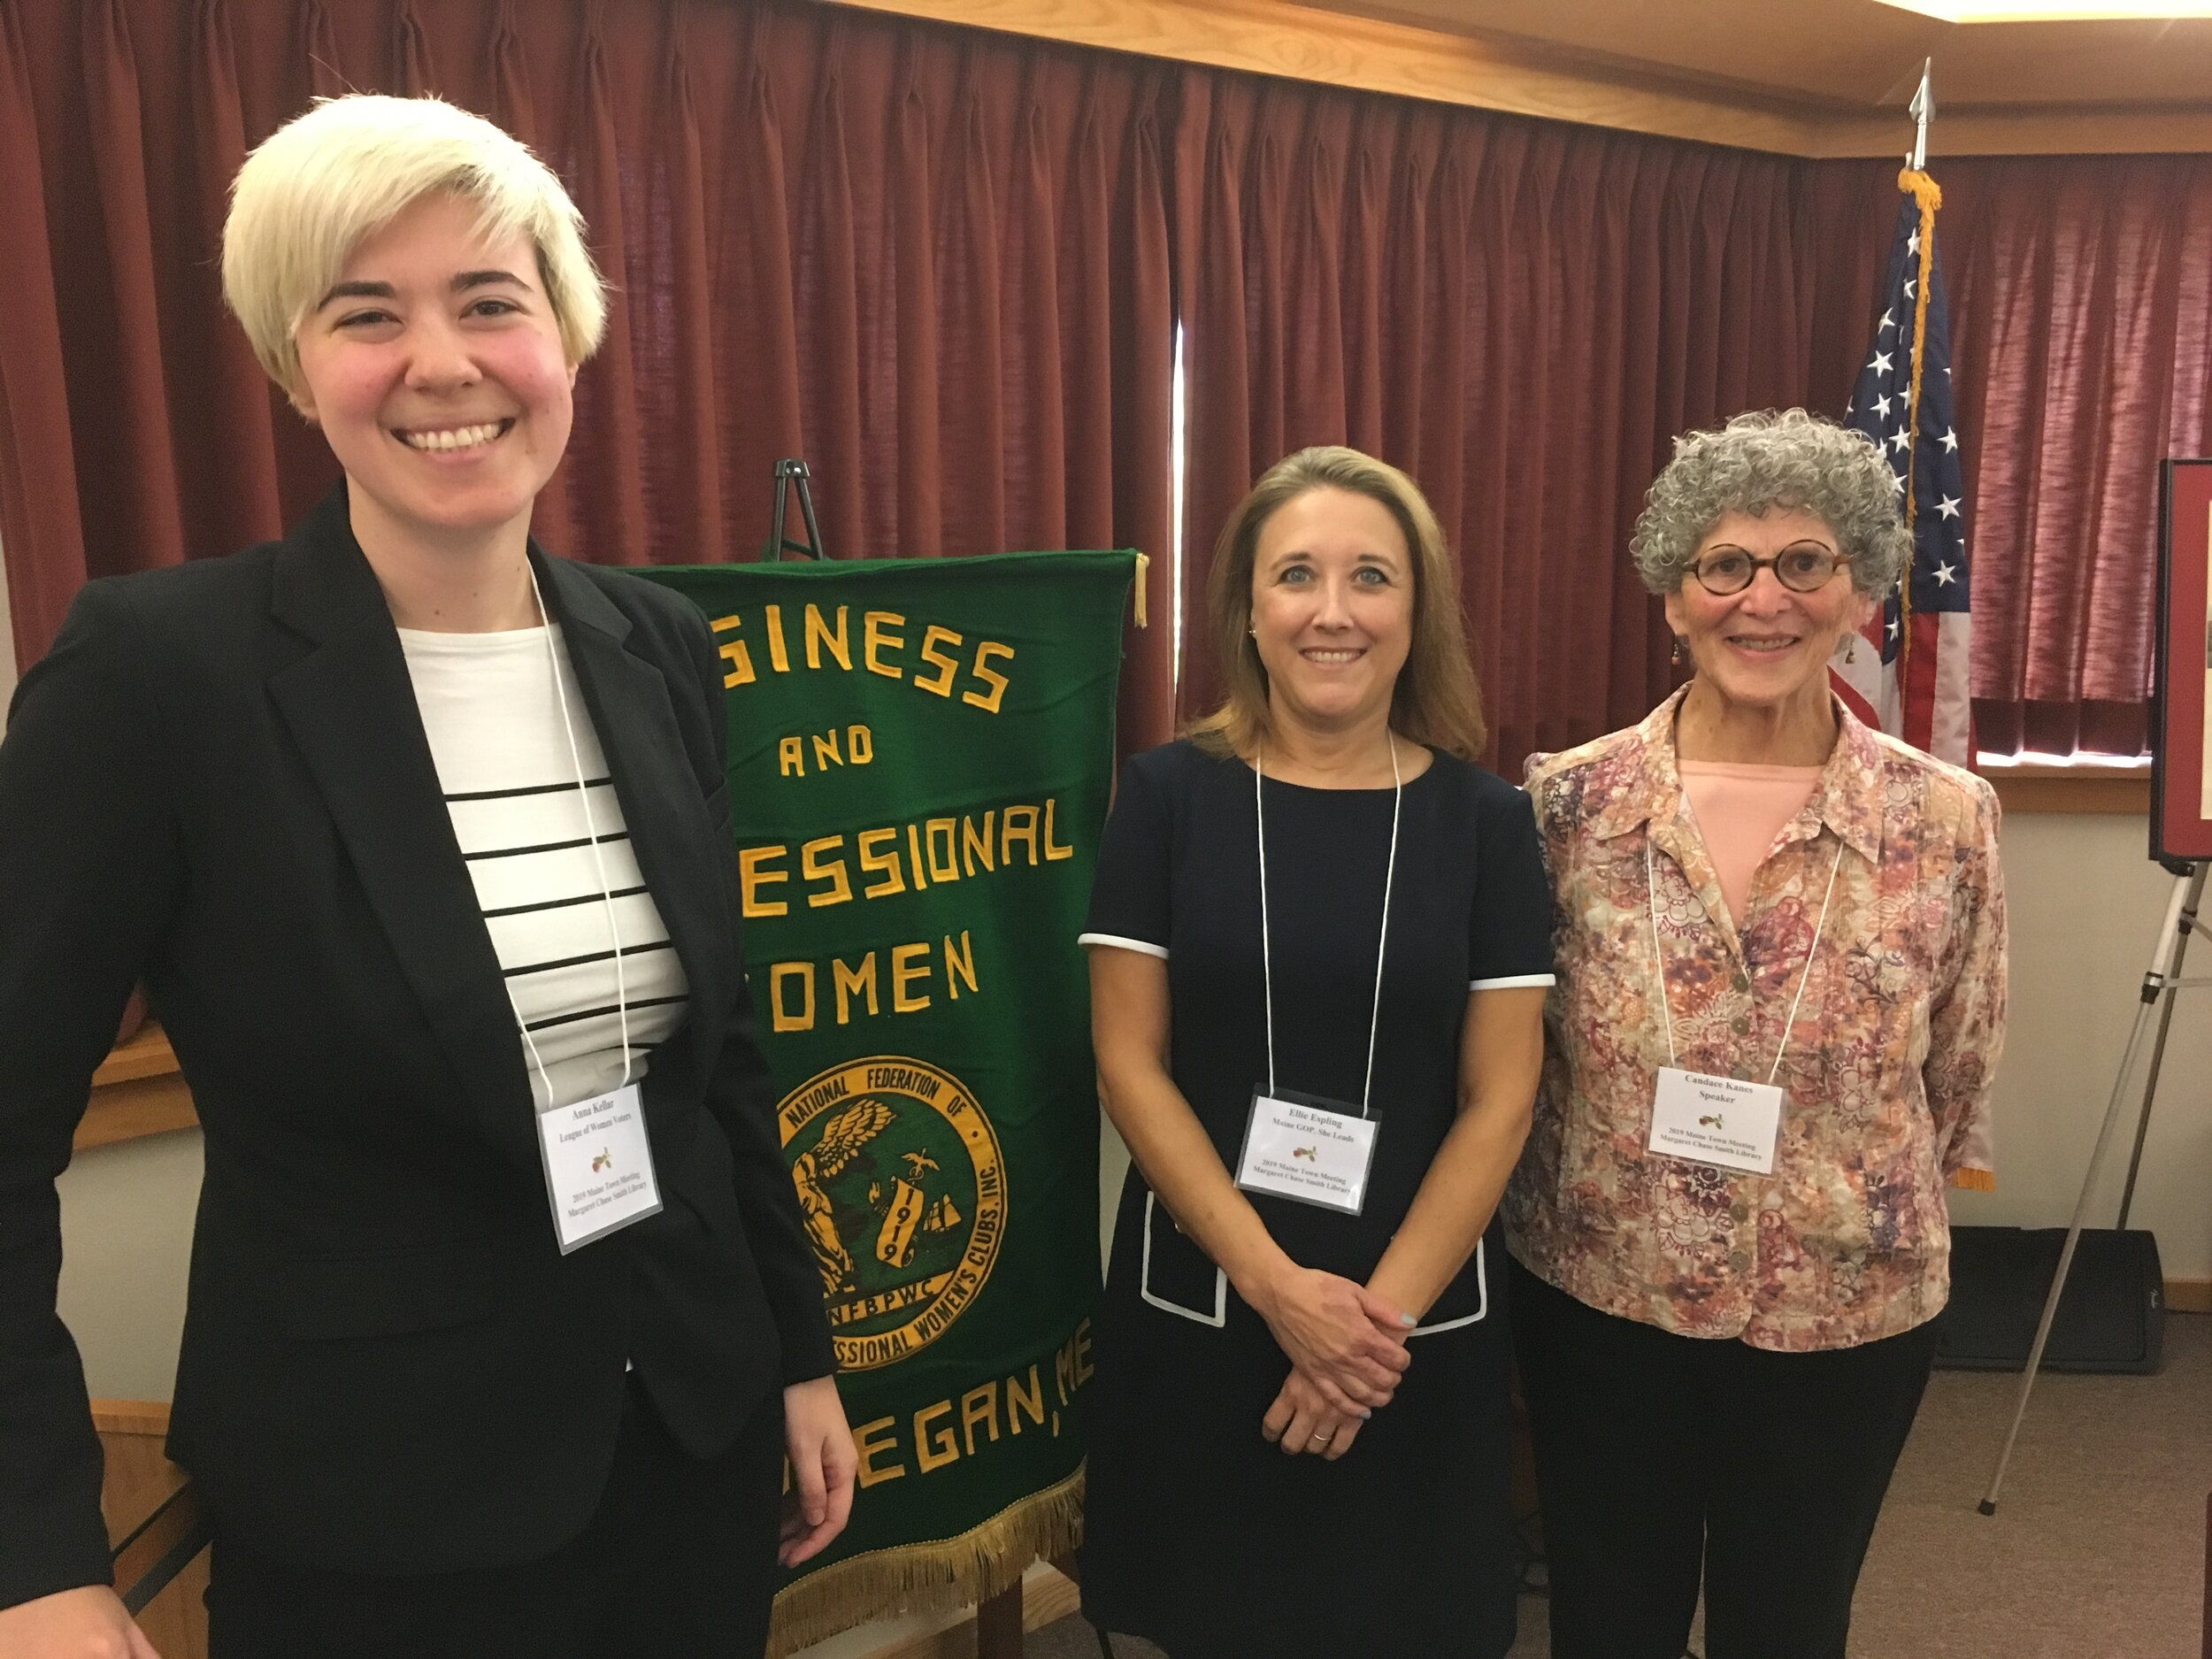 2019 Maine Town Meeting Speakers (L-R) Anna Kellar, Representative Ellie Espling, and Dr. Candace Kanes